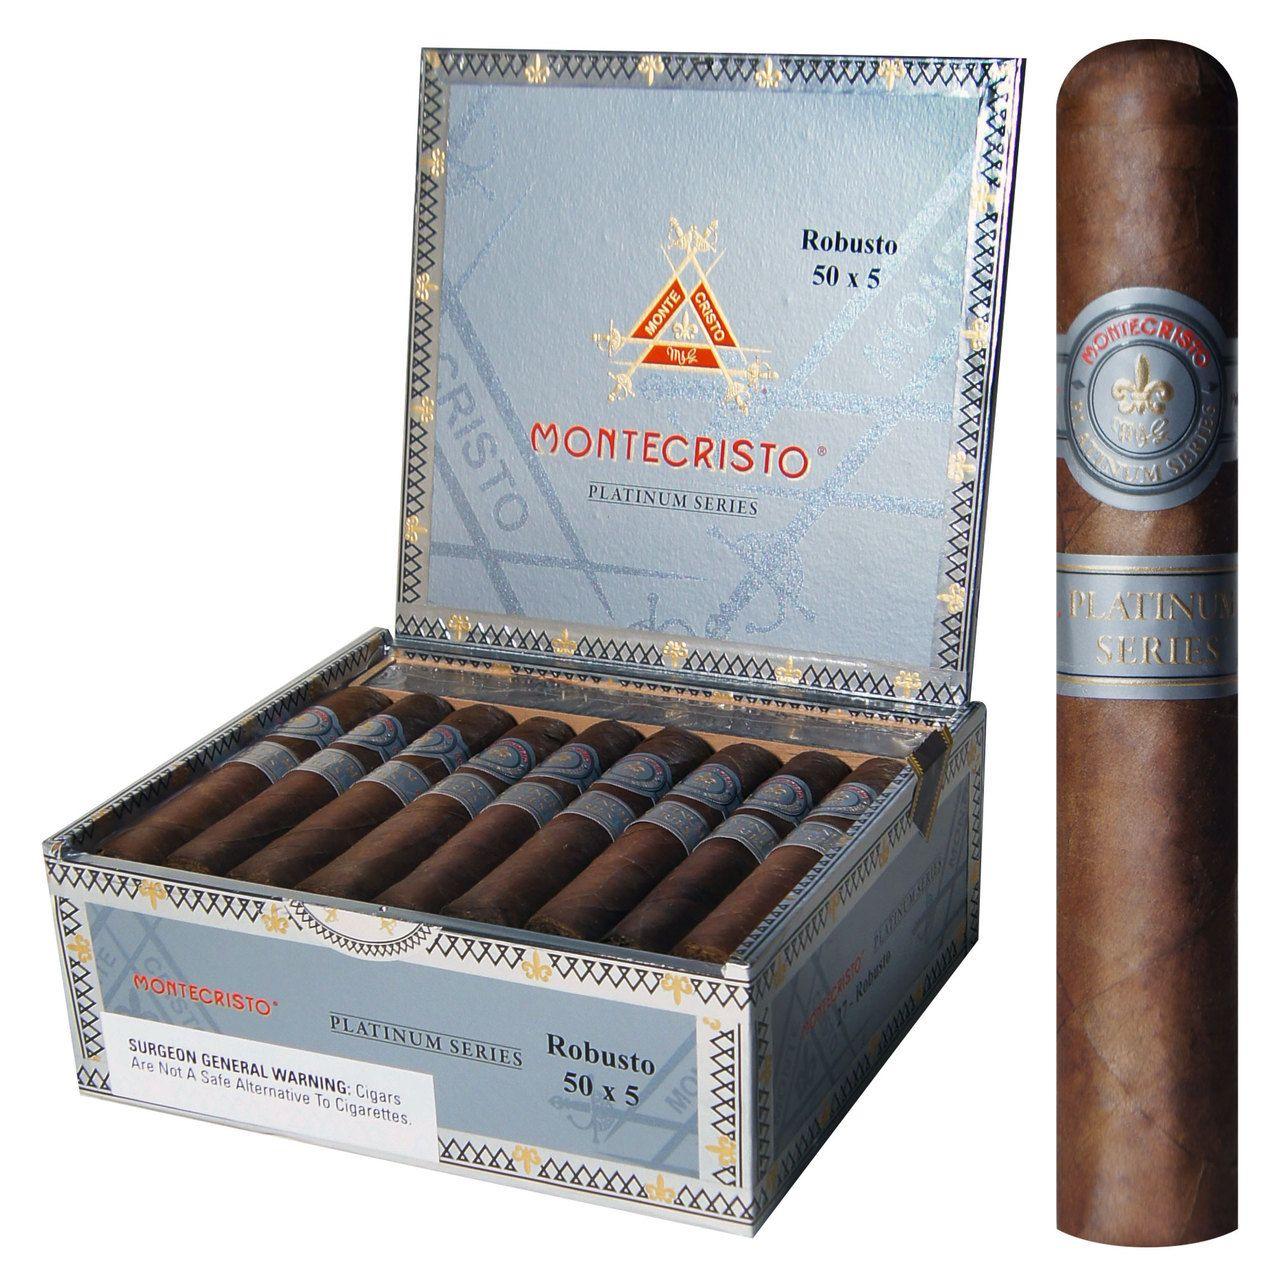 Montecristo Platinum Robusto Cigar 50 X 5 Box Of 27 Cigars Cubaanse Sigaren Sigaren